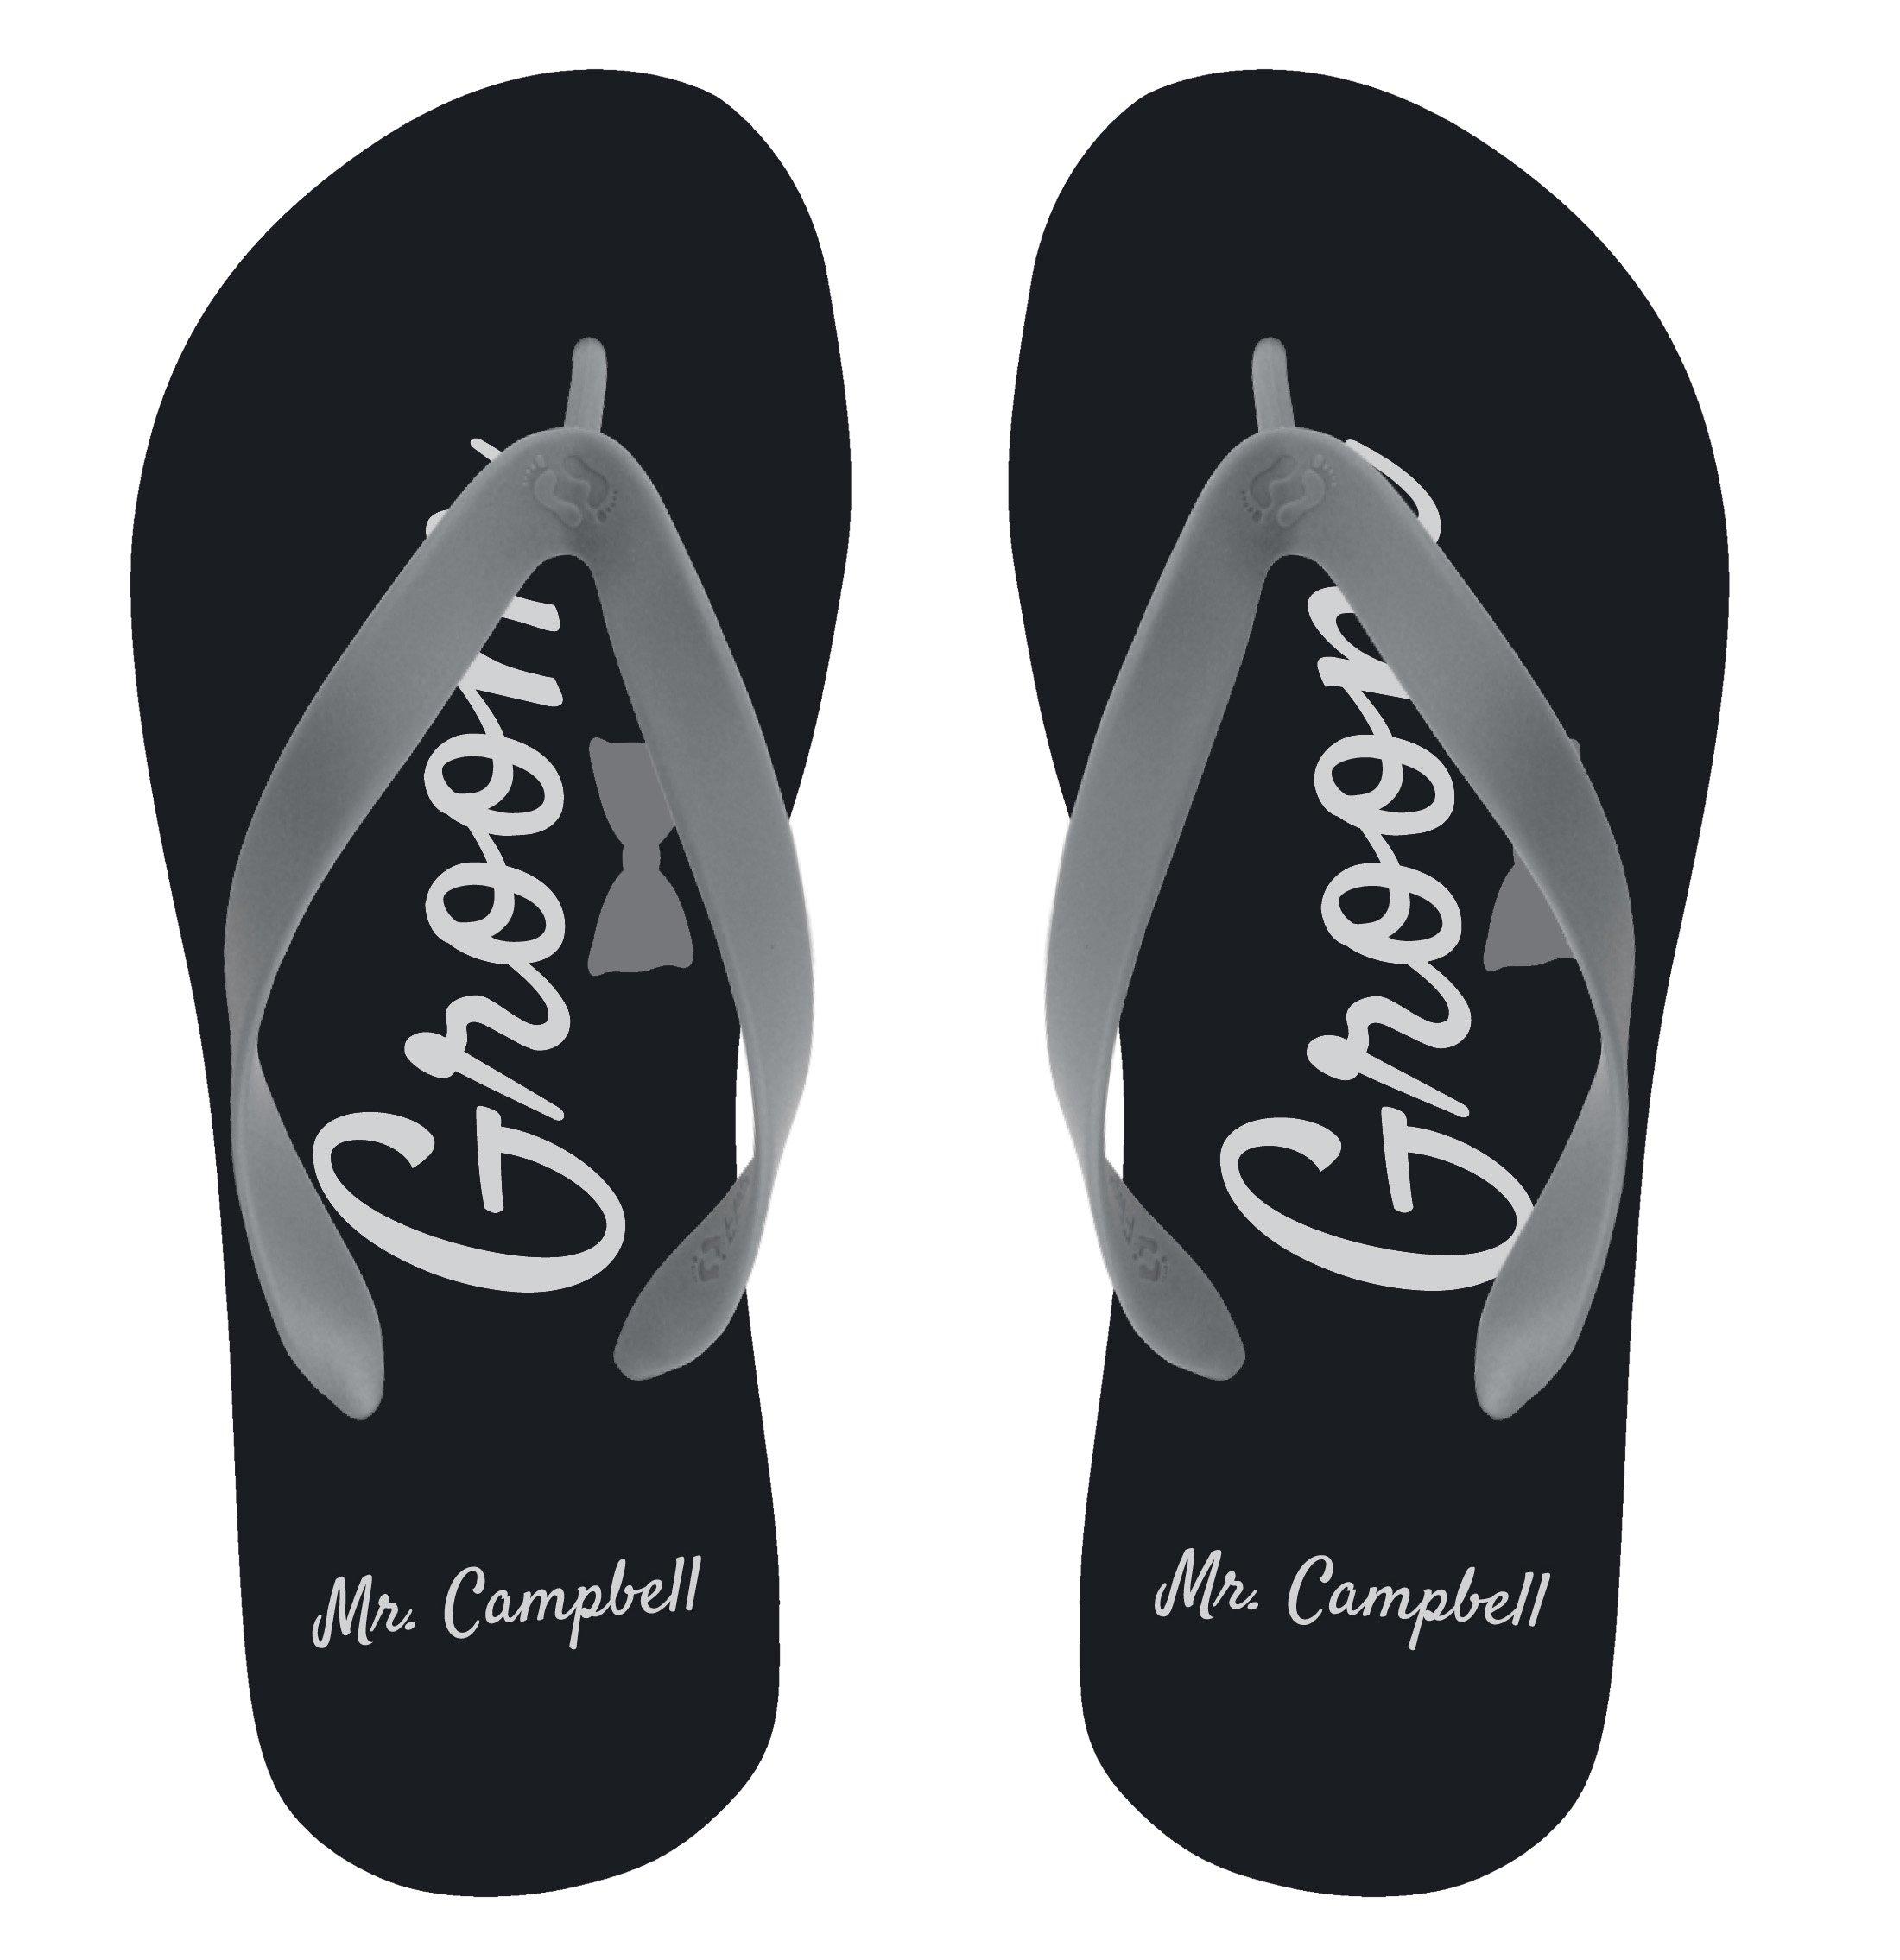 FlipSidez Personalized Groom Flip Flops